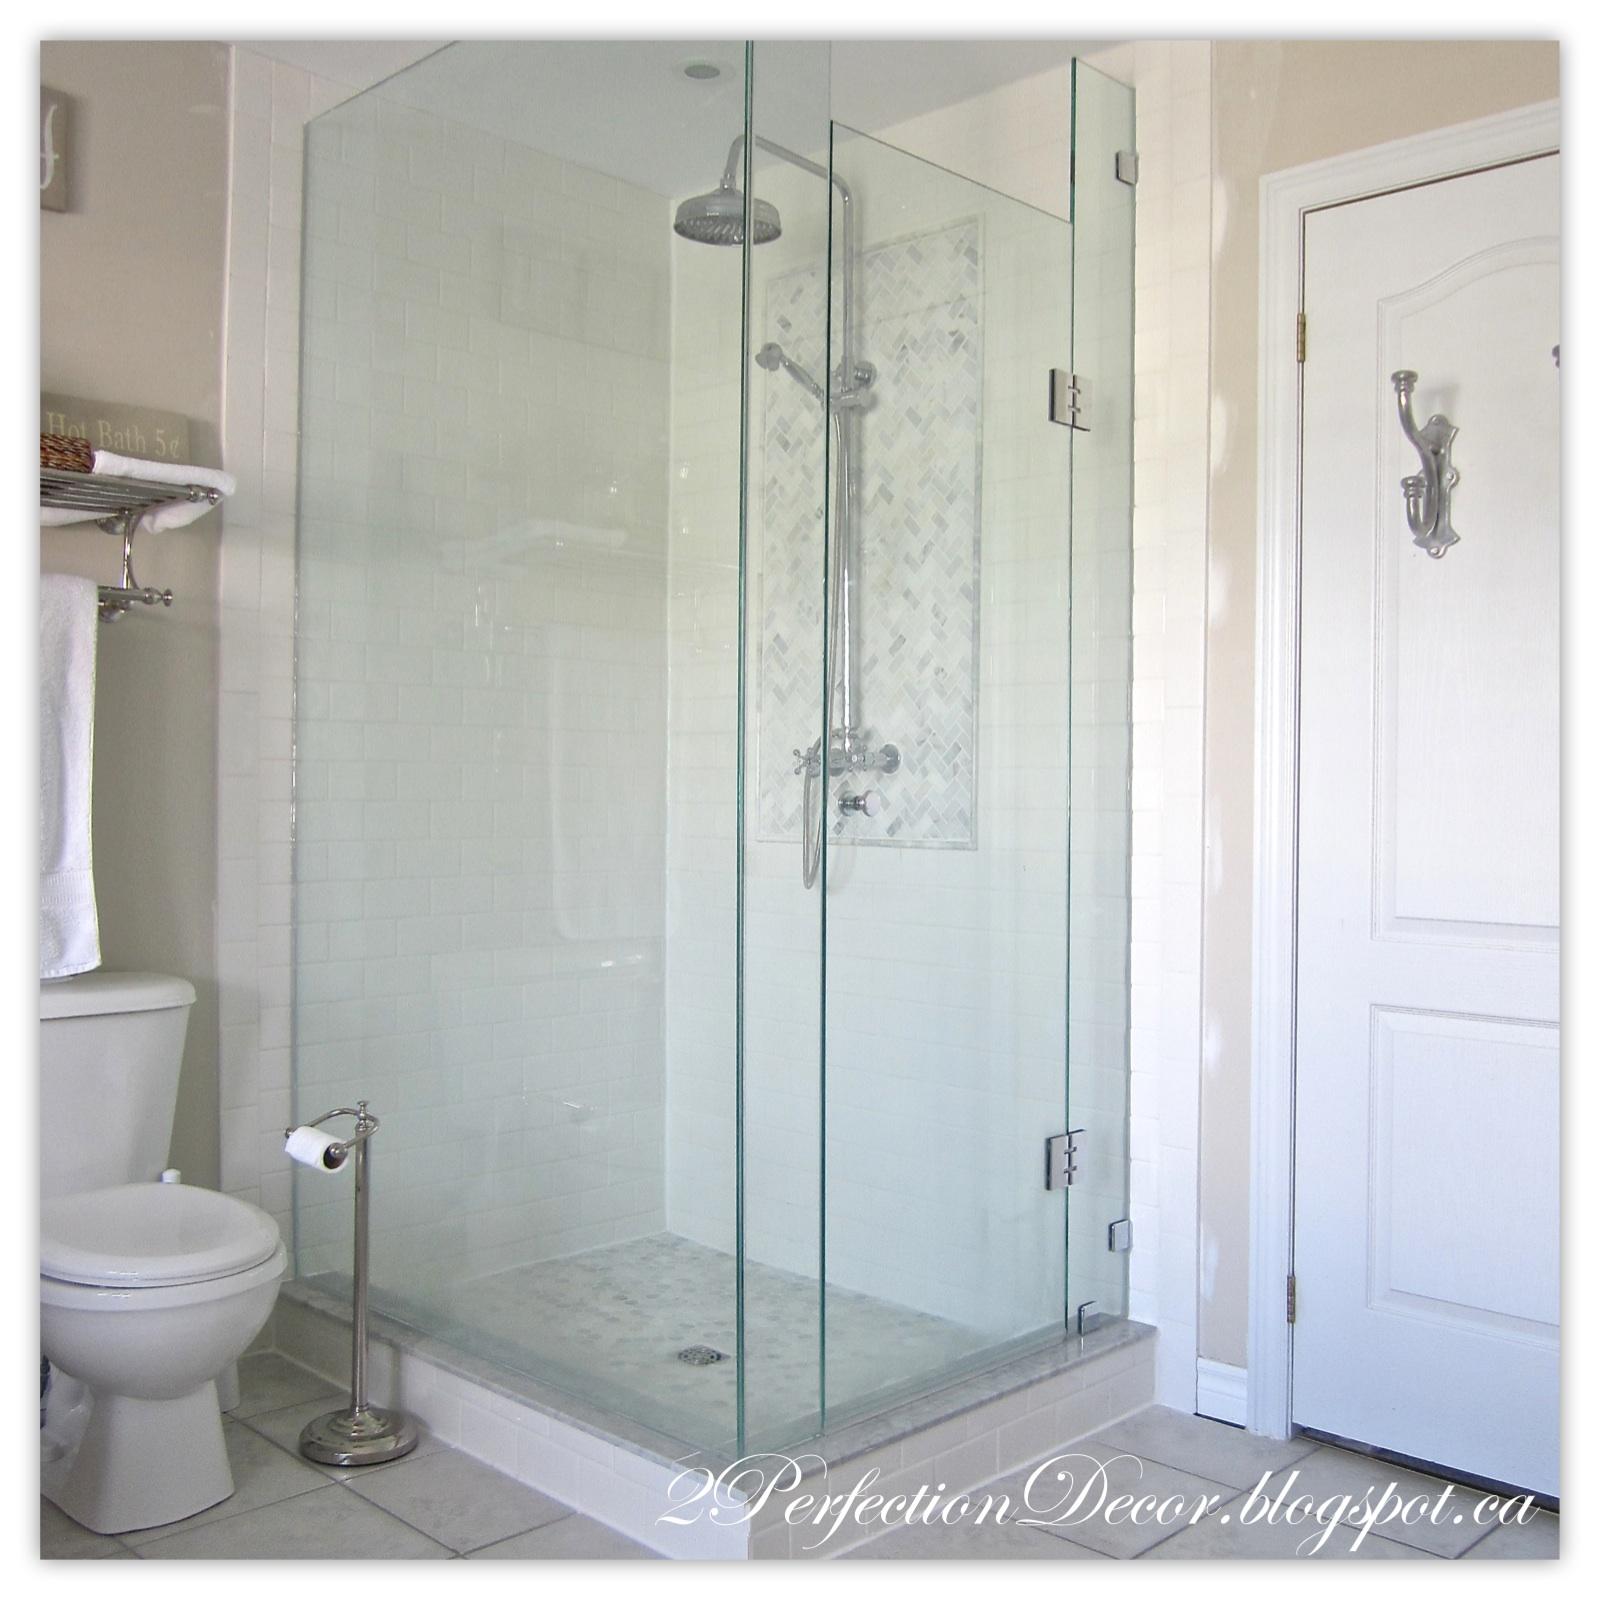 2perfection decor master ensuite shower reveal for Ensuite bathroom ideas design